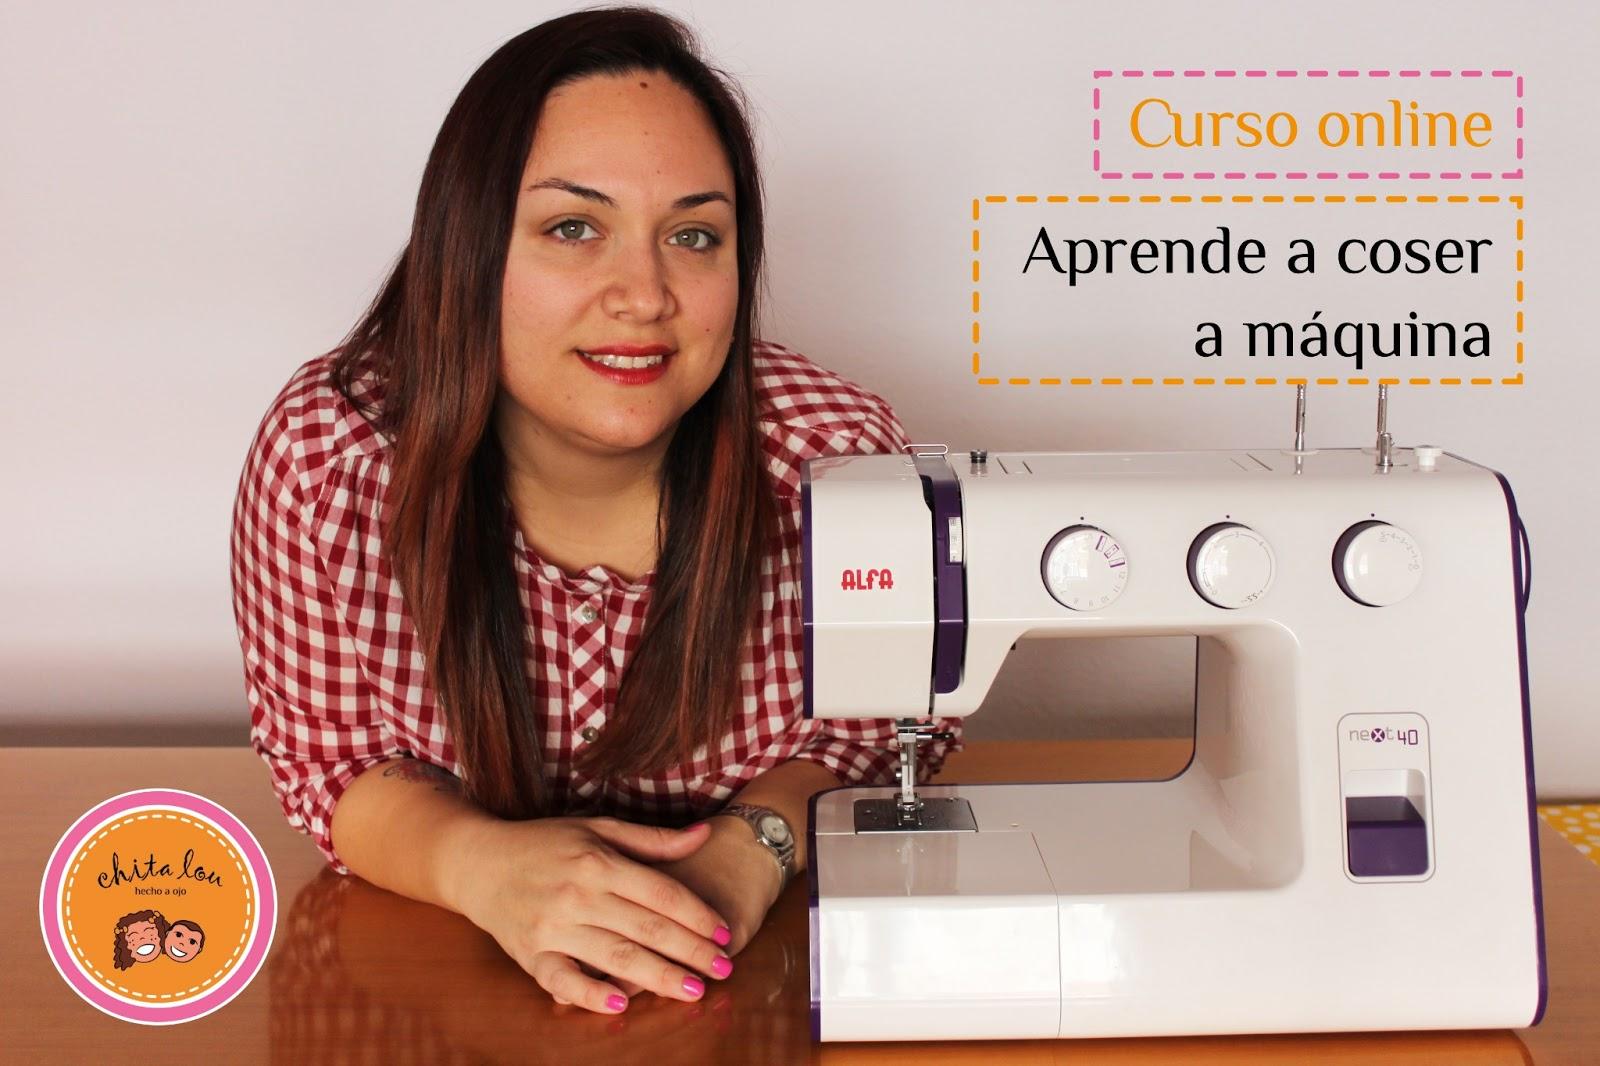 Aprende a coser a máquina. Curso online gratuito - Chita